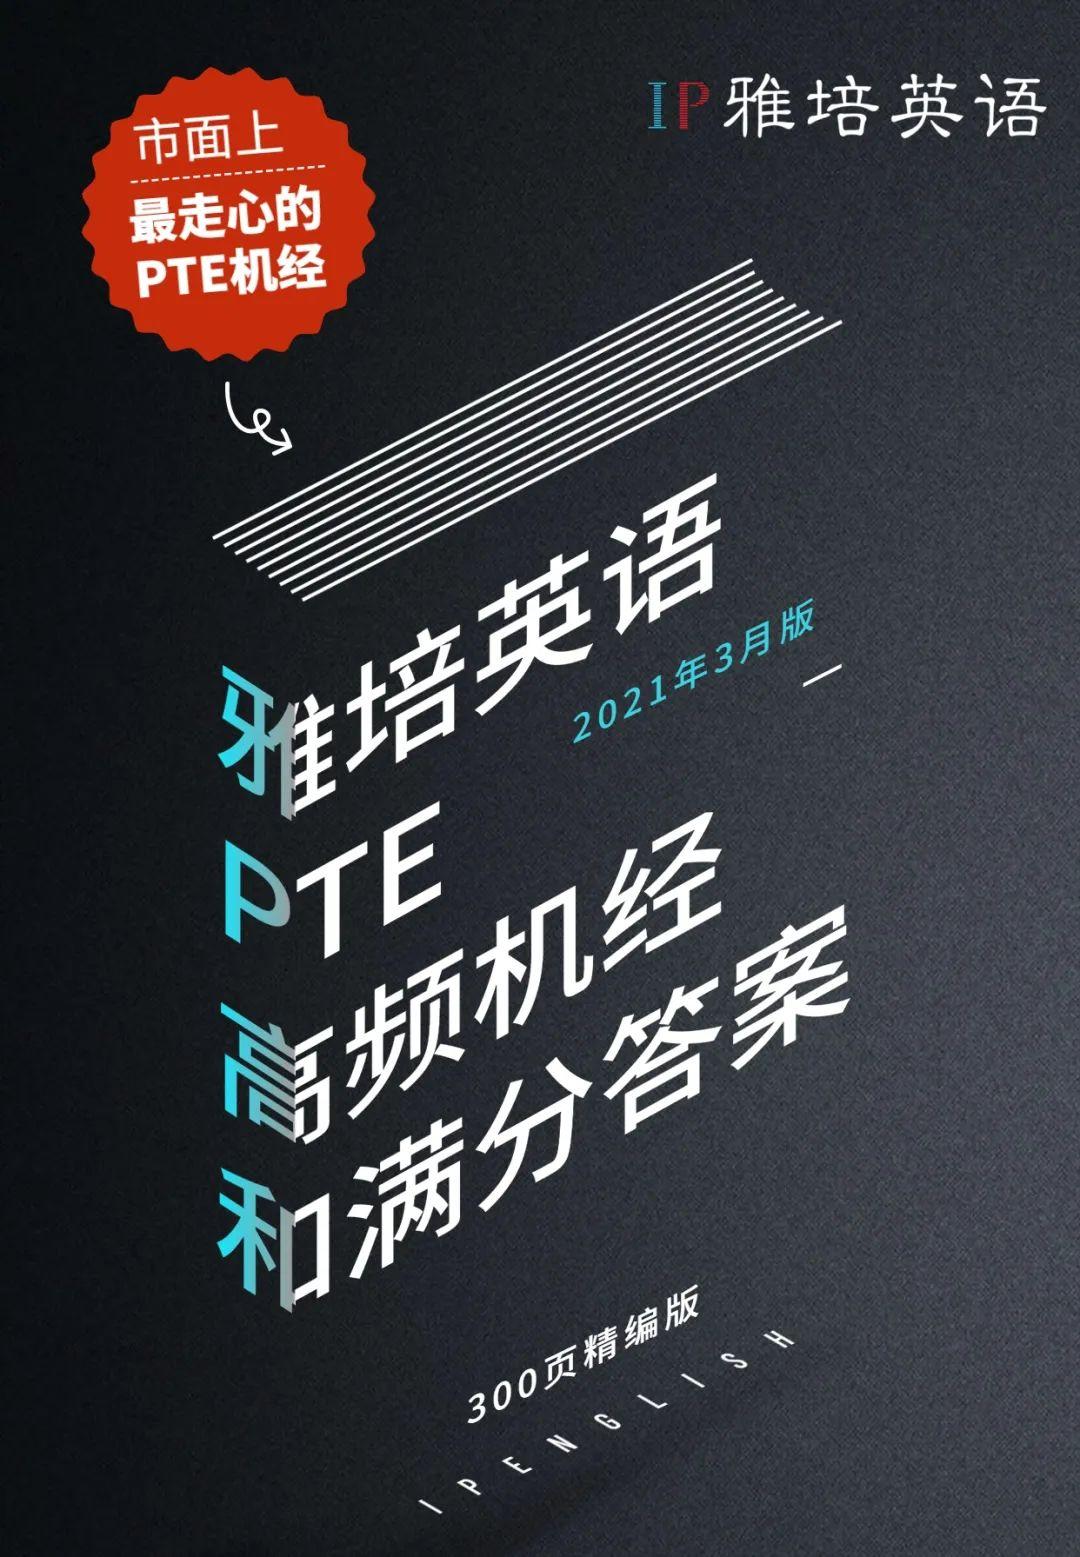 PTE辟谣 - 口语真的语速越快得分越高吗?